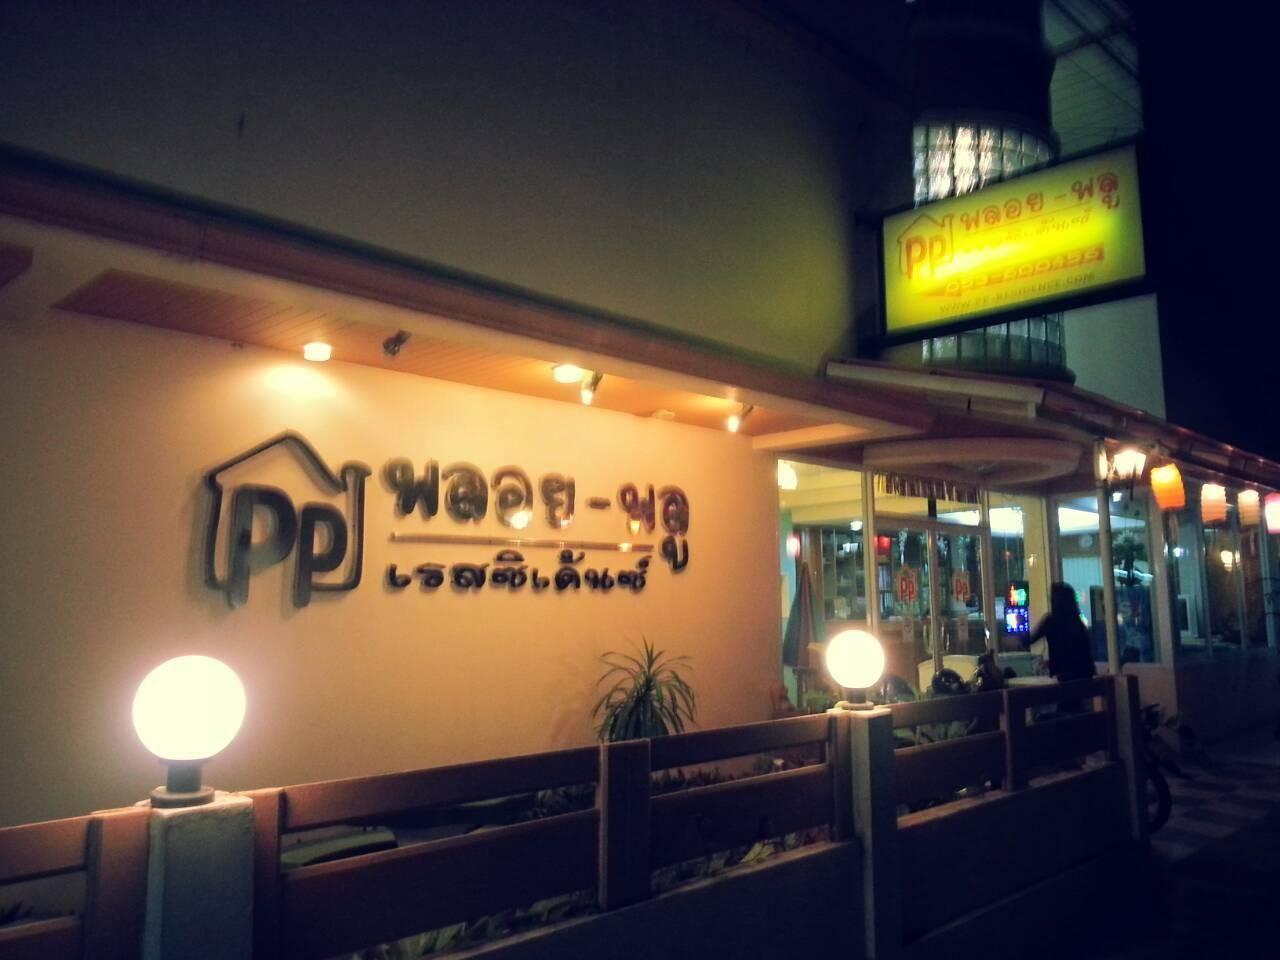 Chiang rai ployplu residence thailand asia ideally